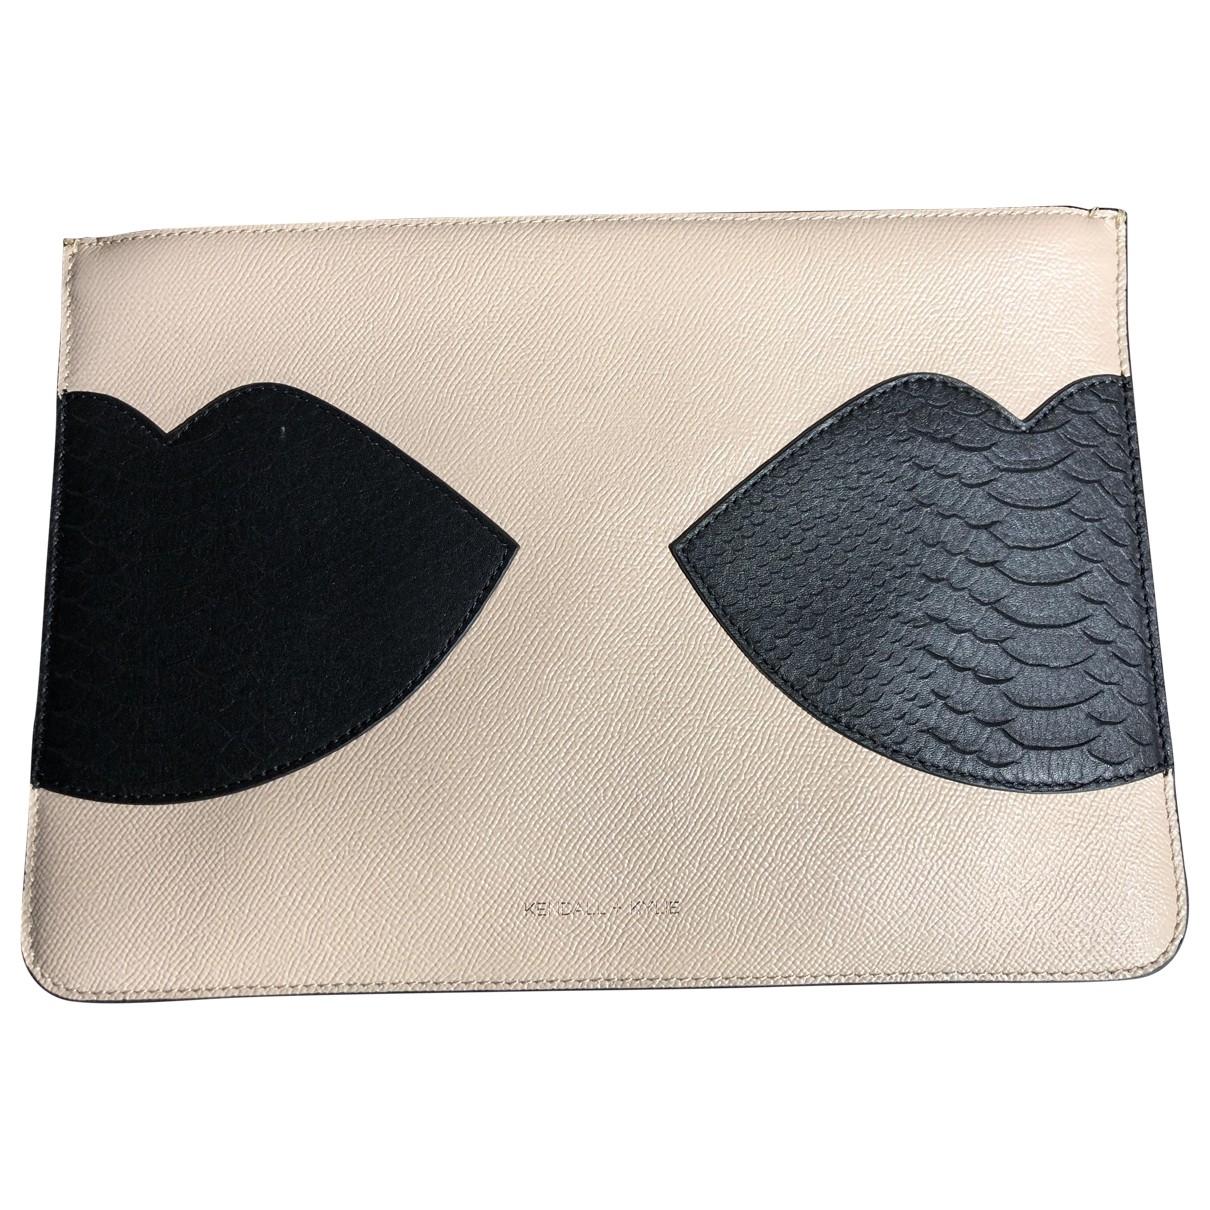 Kendall + Kylie \N Beige Leather Clutch bag for Women \N